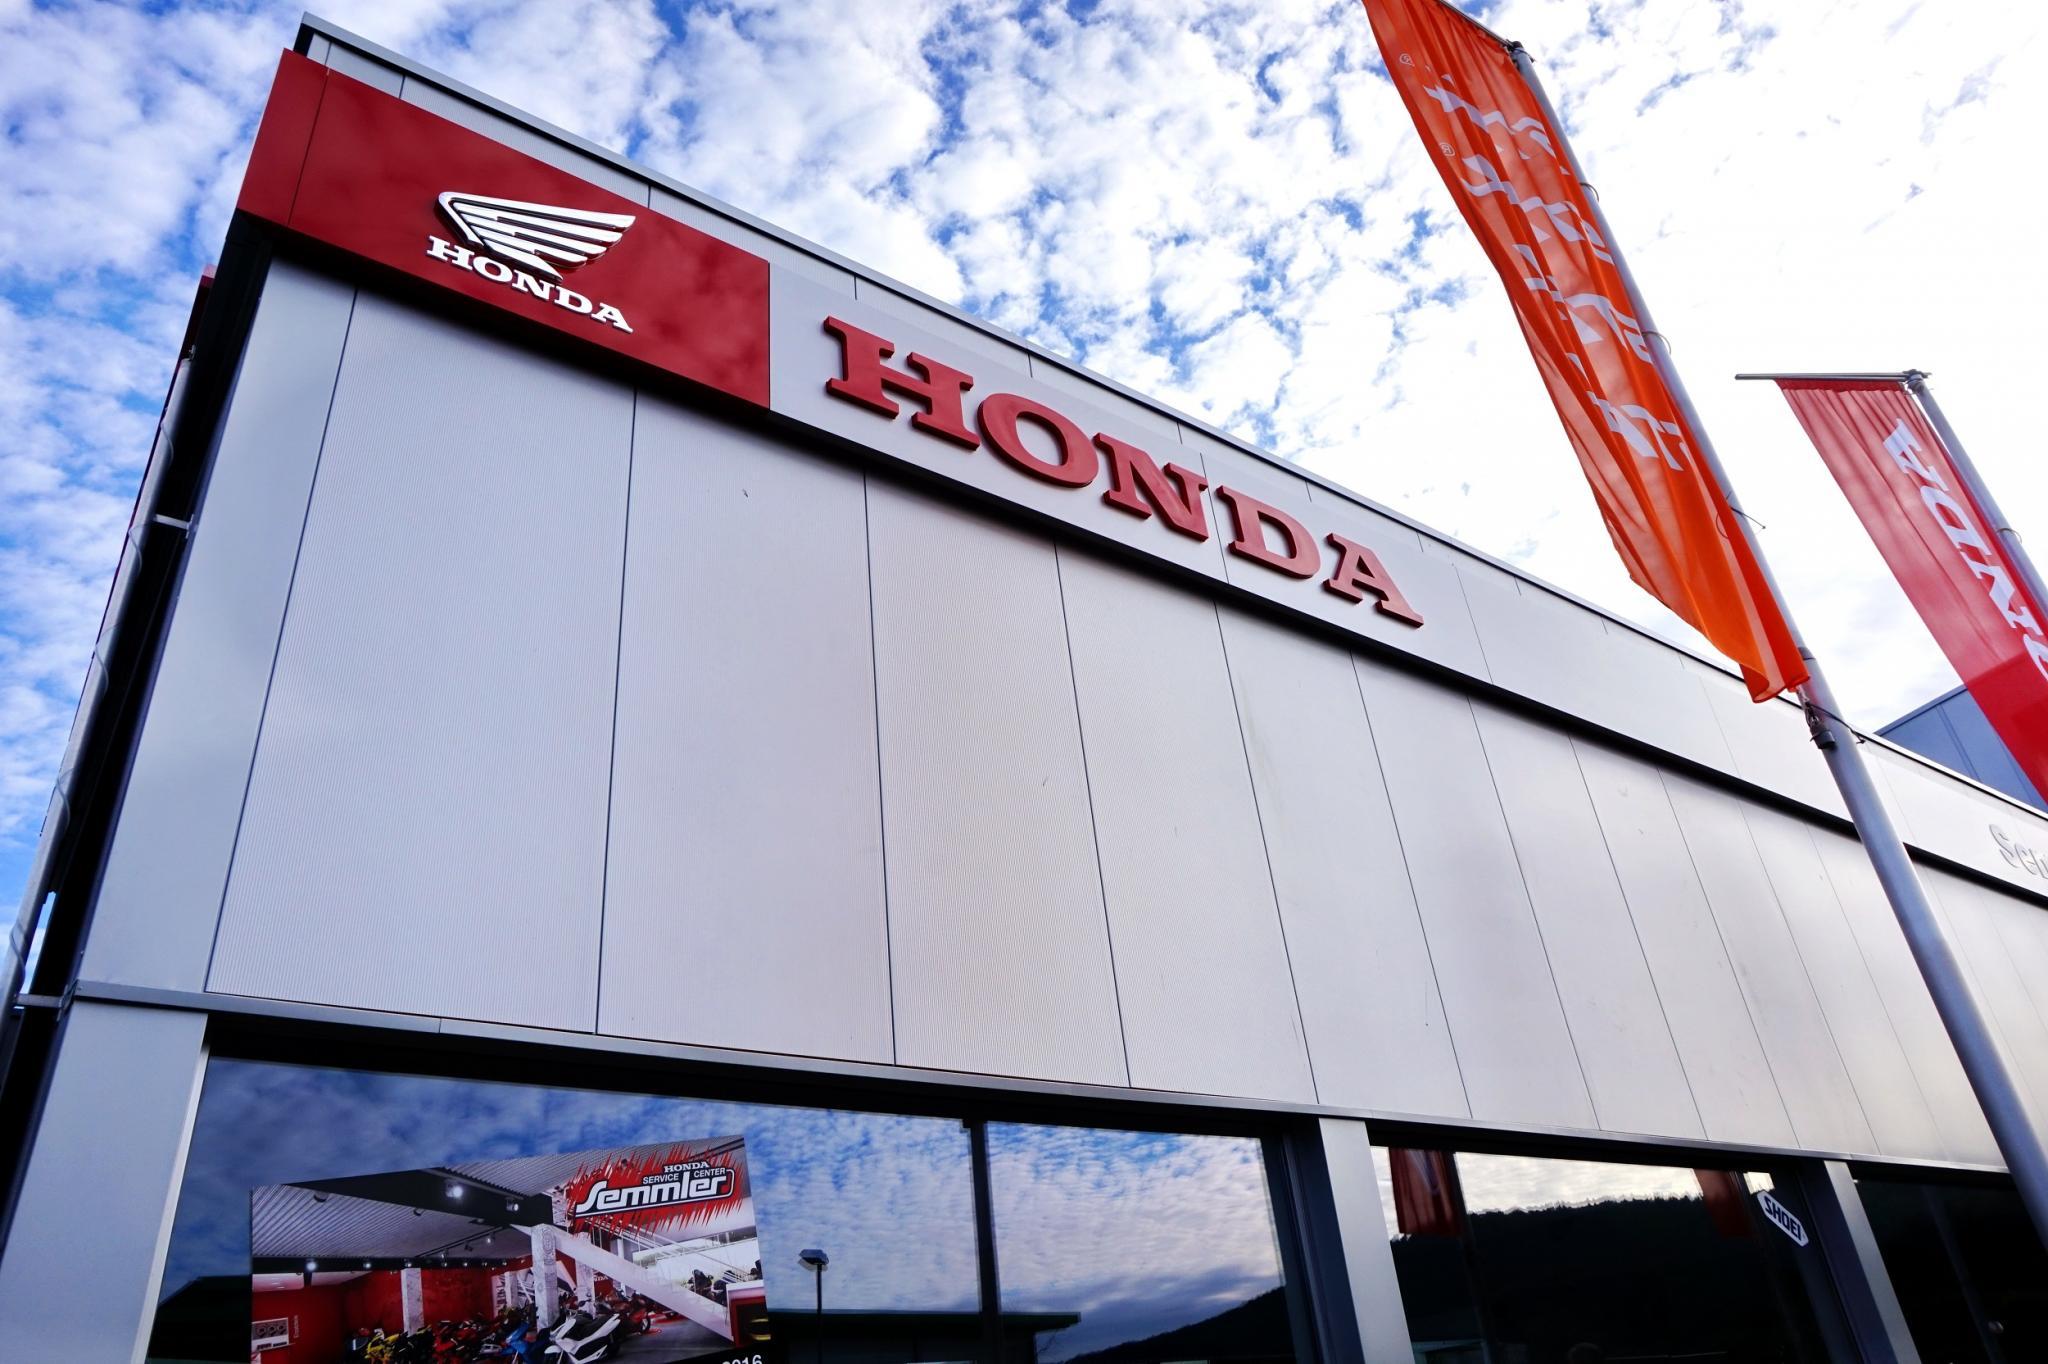 Unternehmensbilder Honda Semmler GbR 23